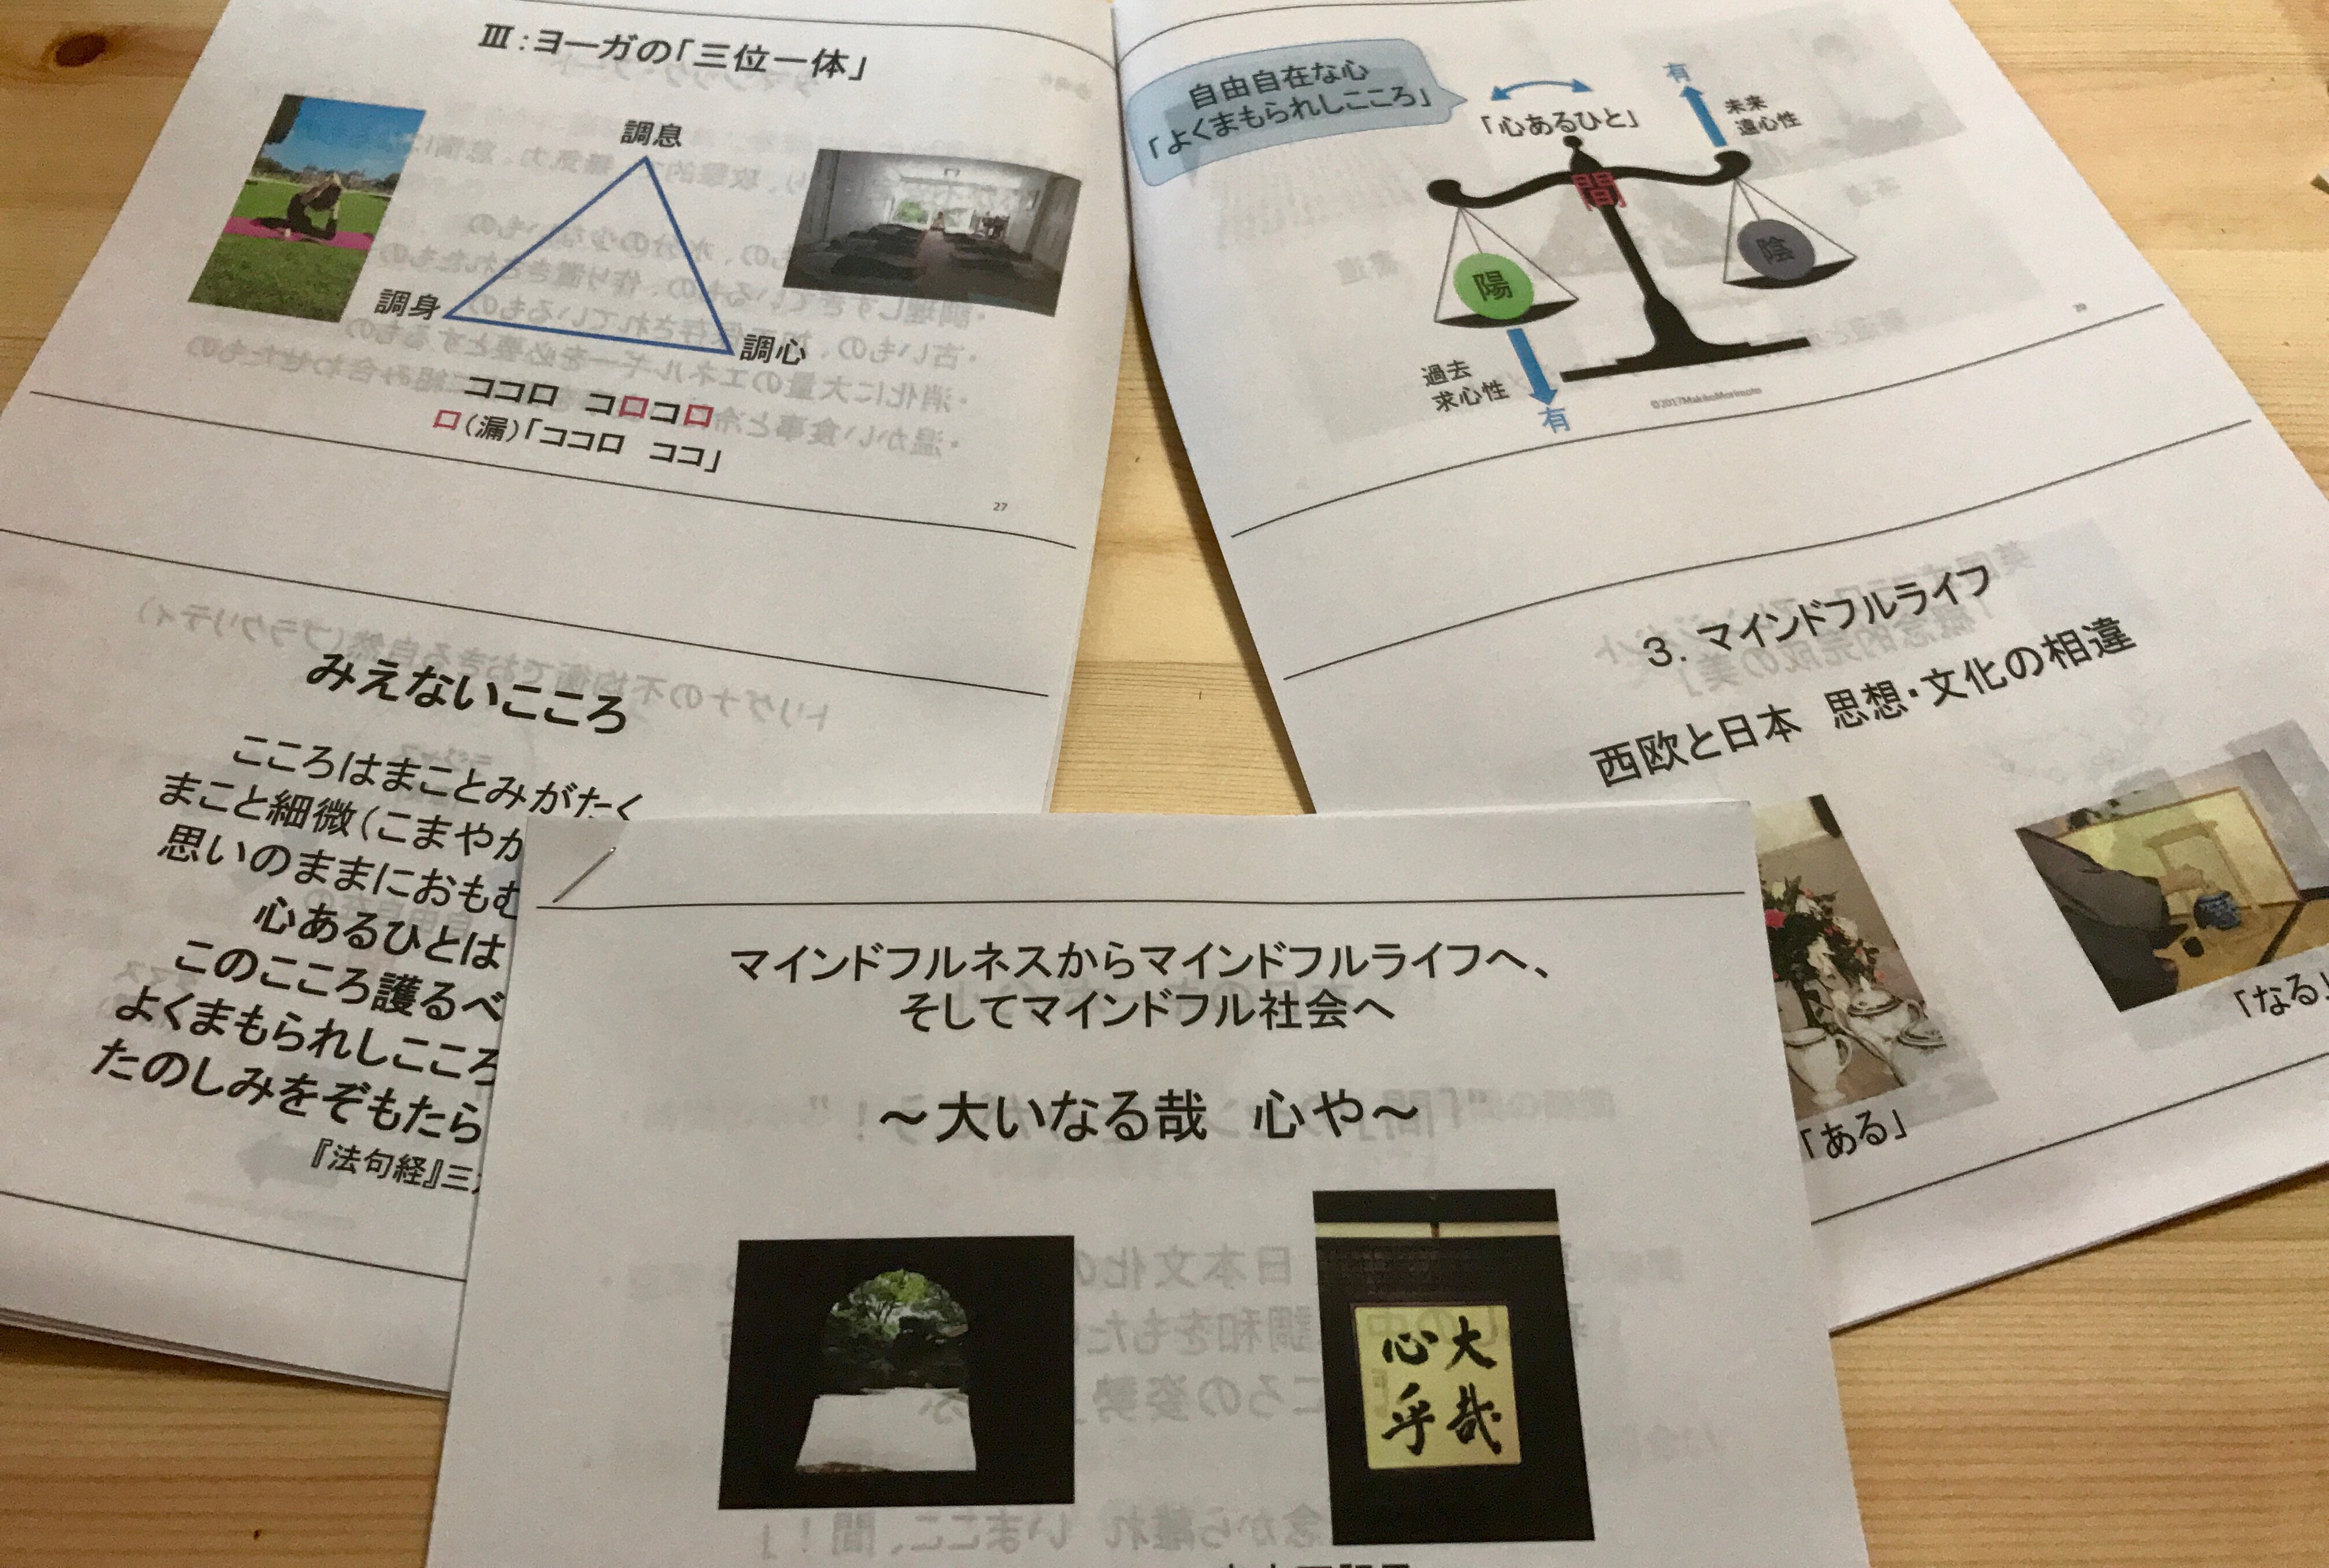 fc2blog_20171021150038351.jpg